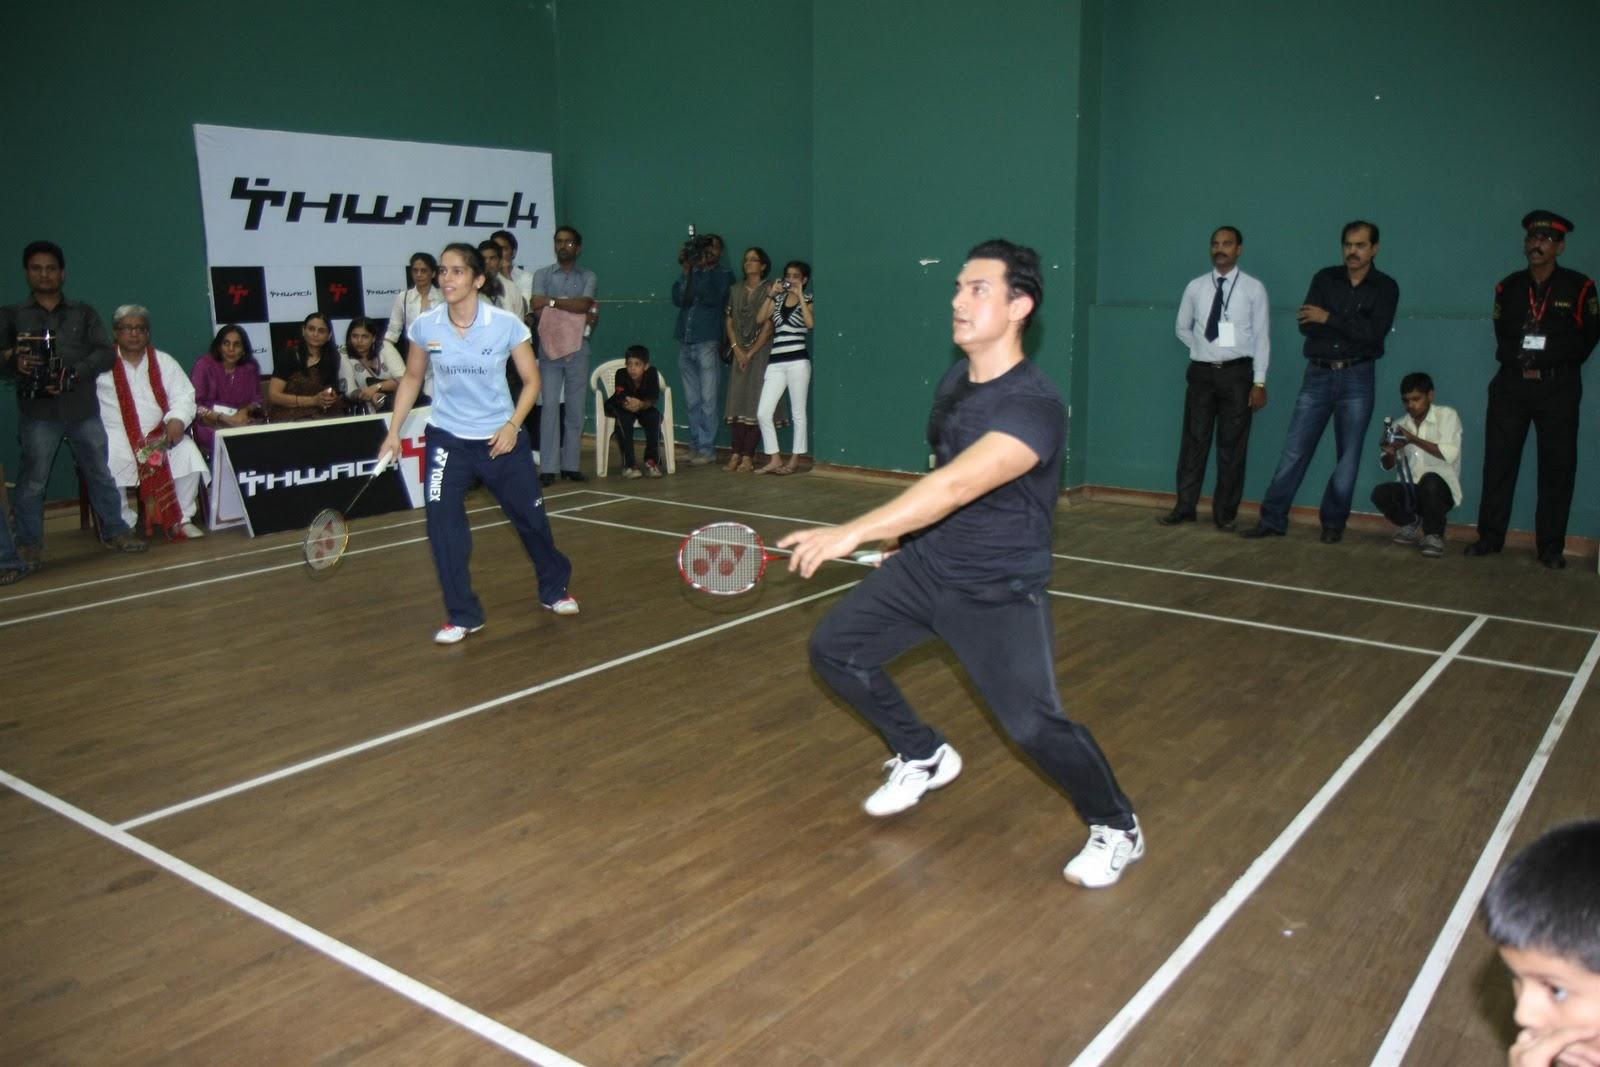 http://2.bp.blogspot.com/-BUnlCiAmhPA/TutwX3QgWmI/AAAAAAAAE_w/r8dP3t2rL8w/s1600/Aamir-Khan-Saina-Nehwal-at-exhibition-match-18.JPG